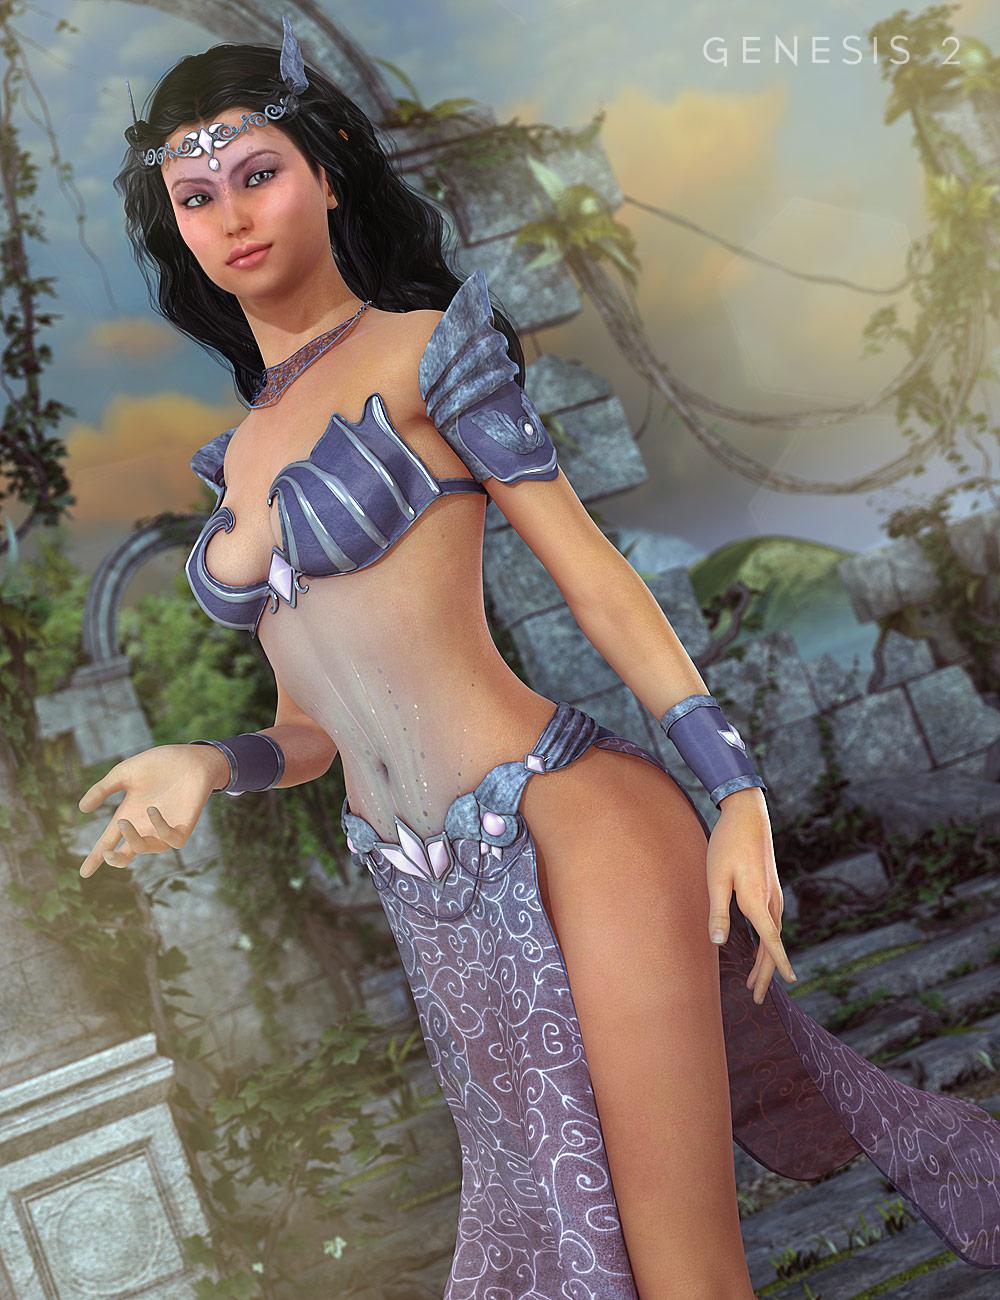 Aloisia by: JessaiiWildDesigns, 3D Models by Daz 3D